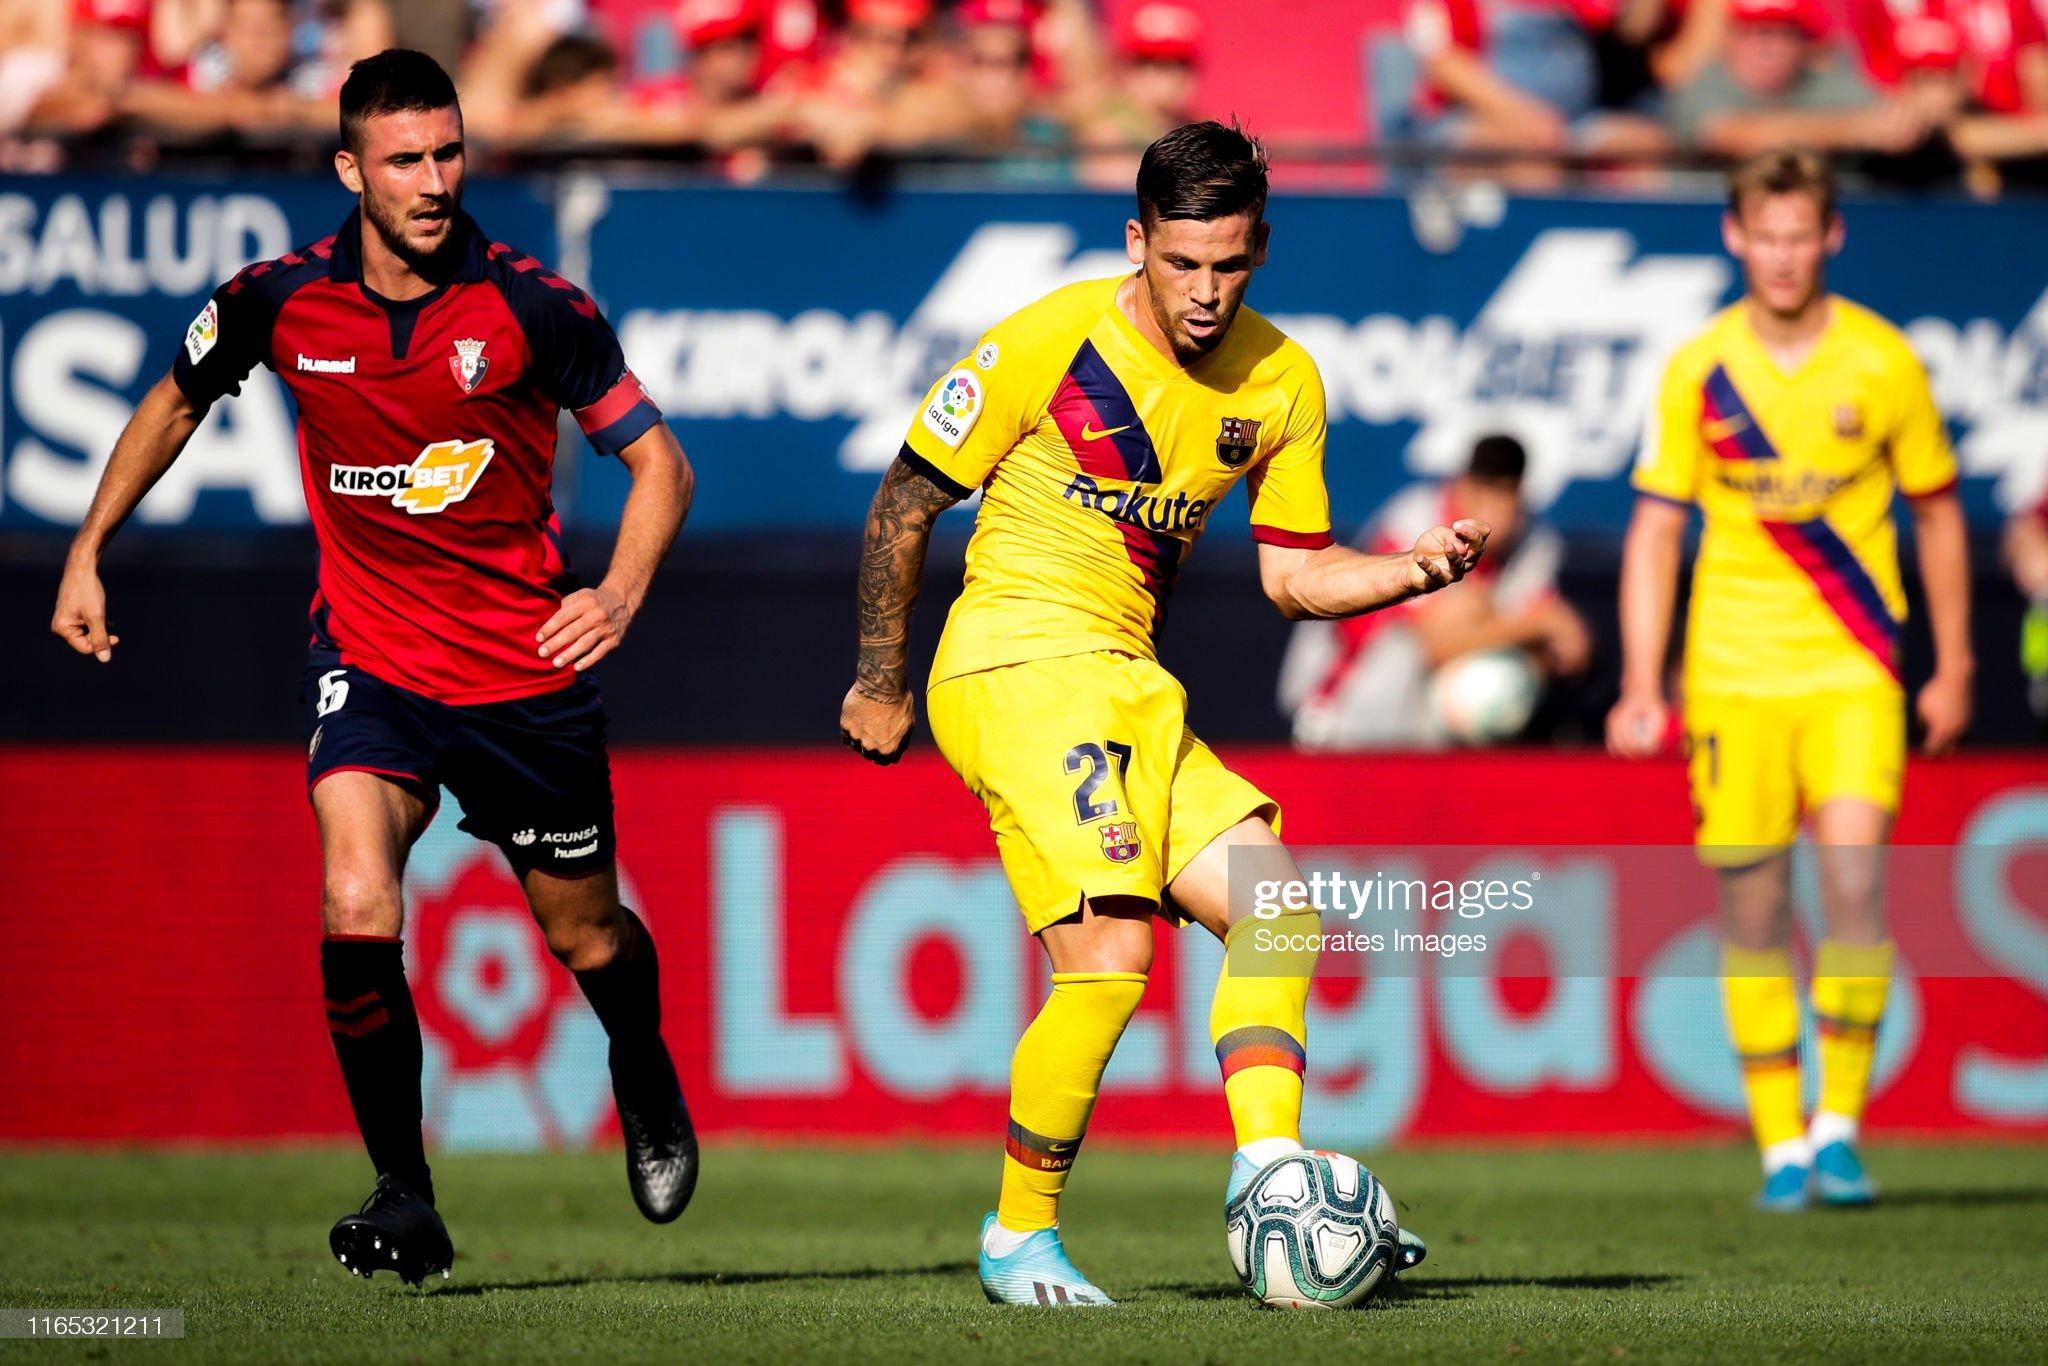 صور مباراة : أوساسونا - برشلونة 2-2 ( 31-08-2019 )  Carles-perez-of-fc-barcelona-during-the-la-liga-santander-match-v-picture-id1165321211?s=2048x2048